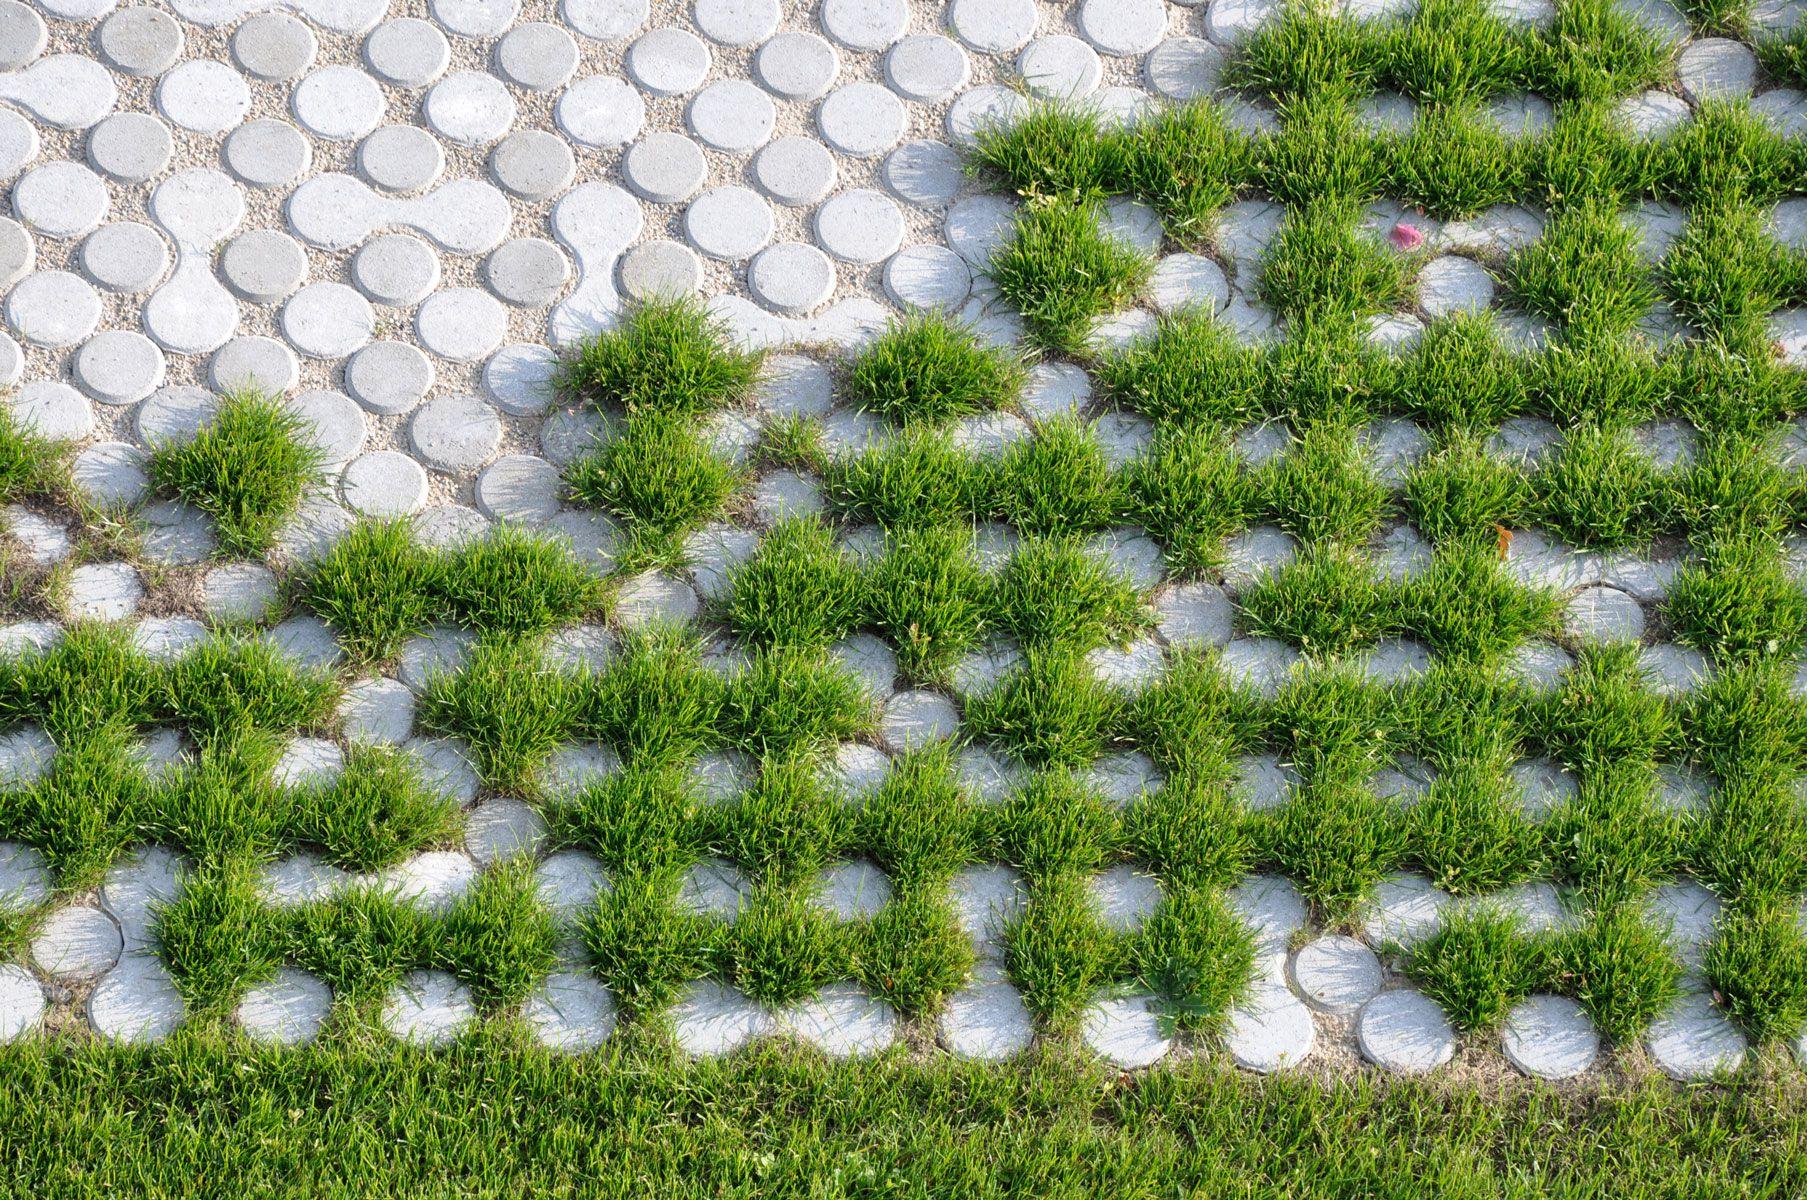 Dalle Beton Parking Herbe herbe pavé rond | aménagement paysager, paysagiste, sol